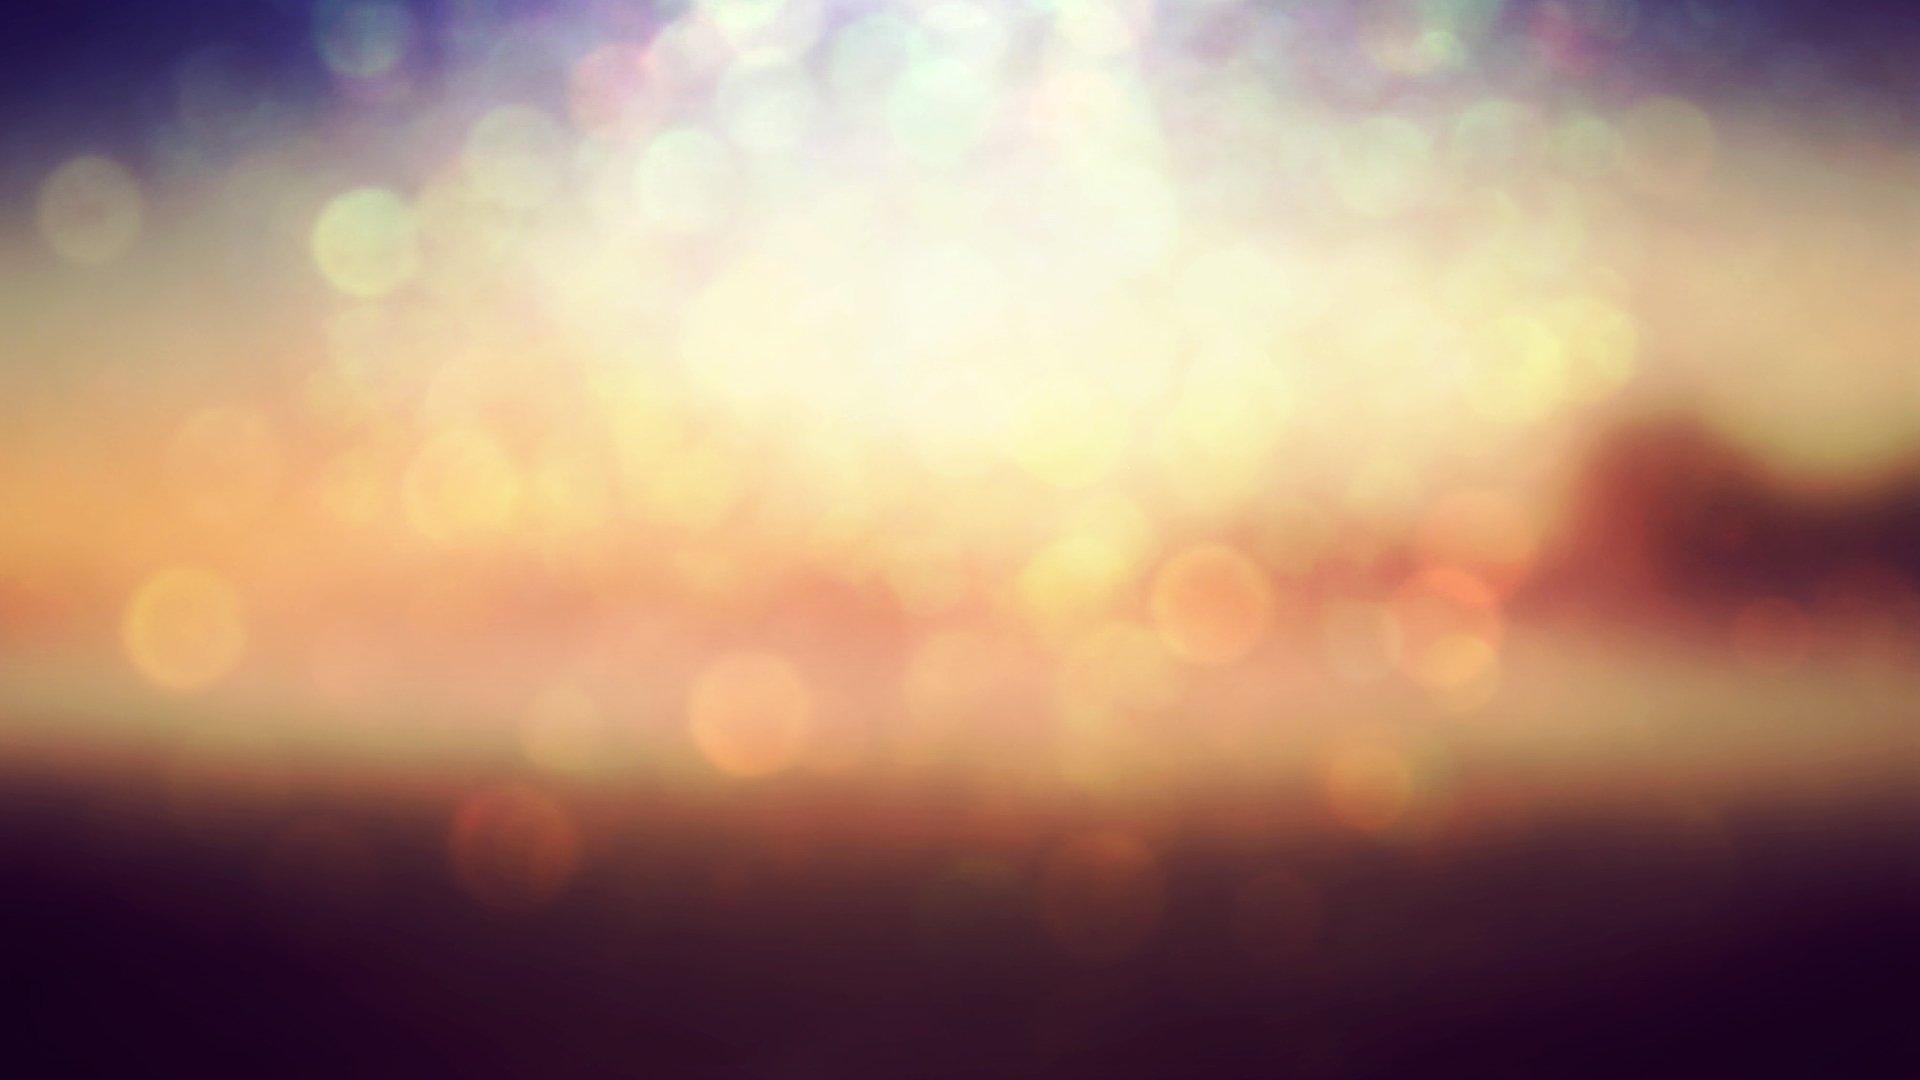 Обои Цвет, Облака, узор, свет. Абстракции foto 9